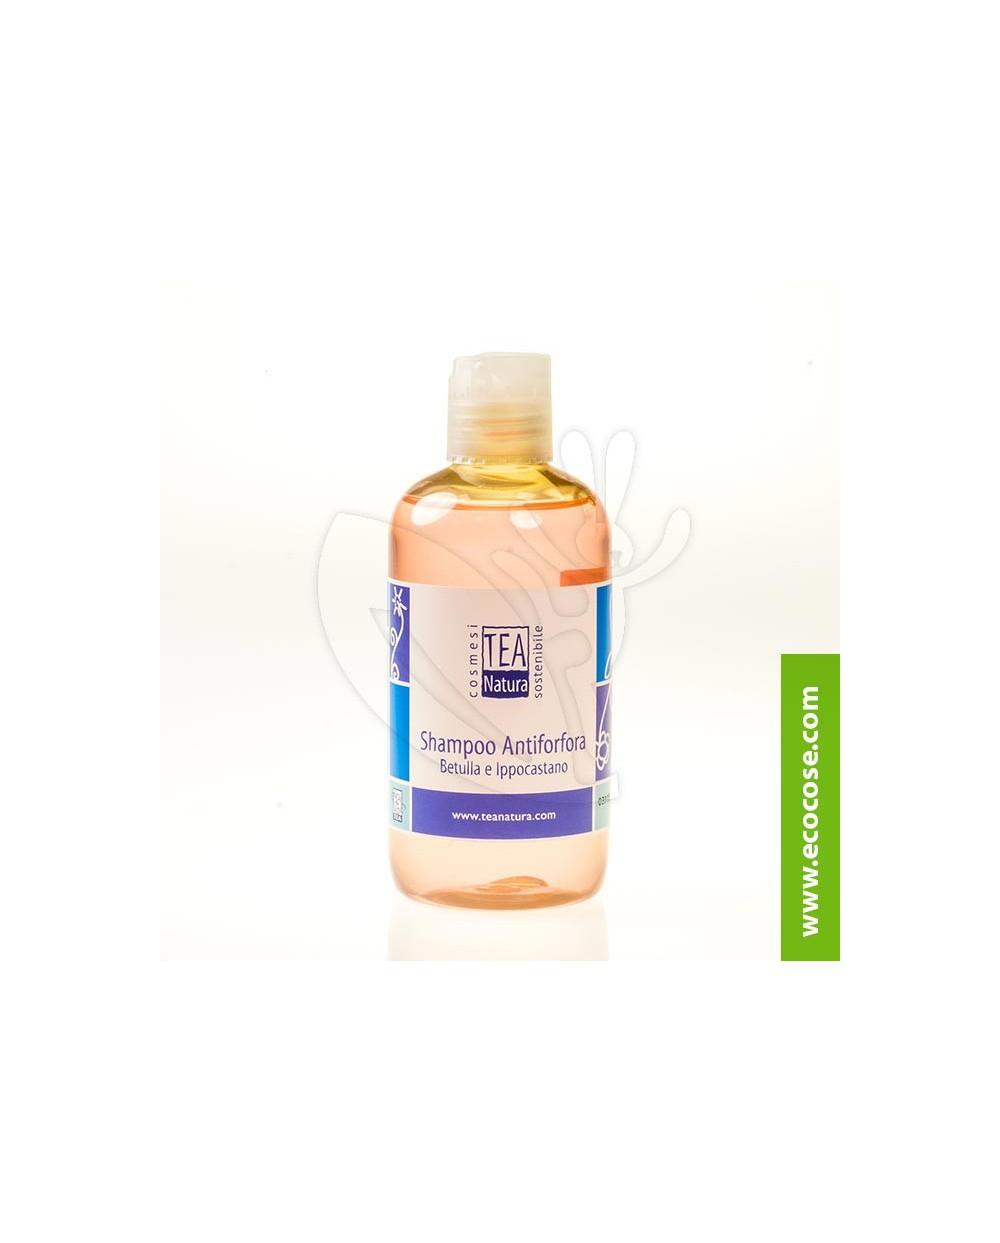 Tea Natura - Shampoo antiforfora Betulla e Ippocastano